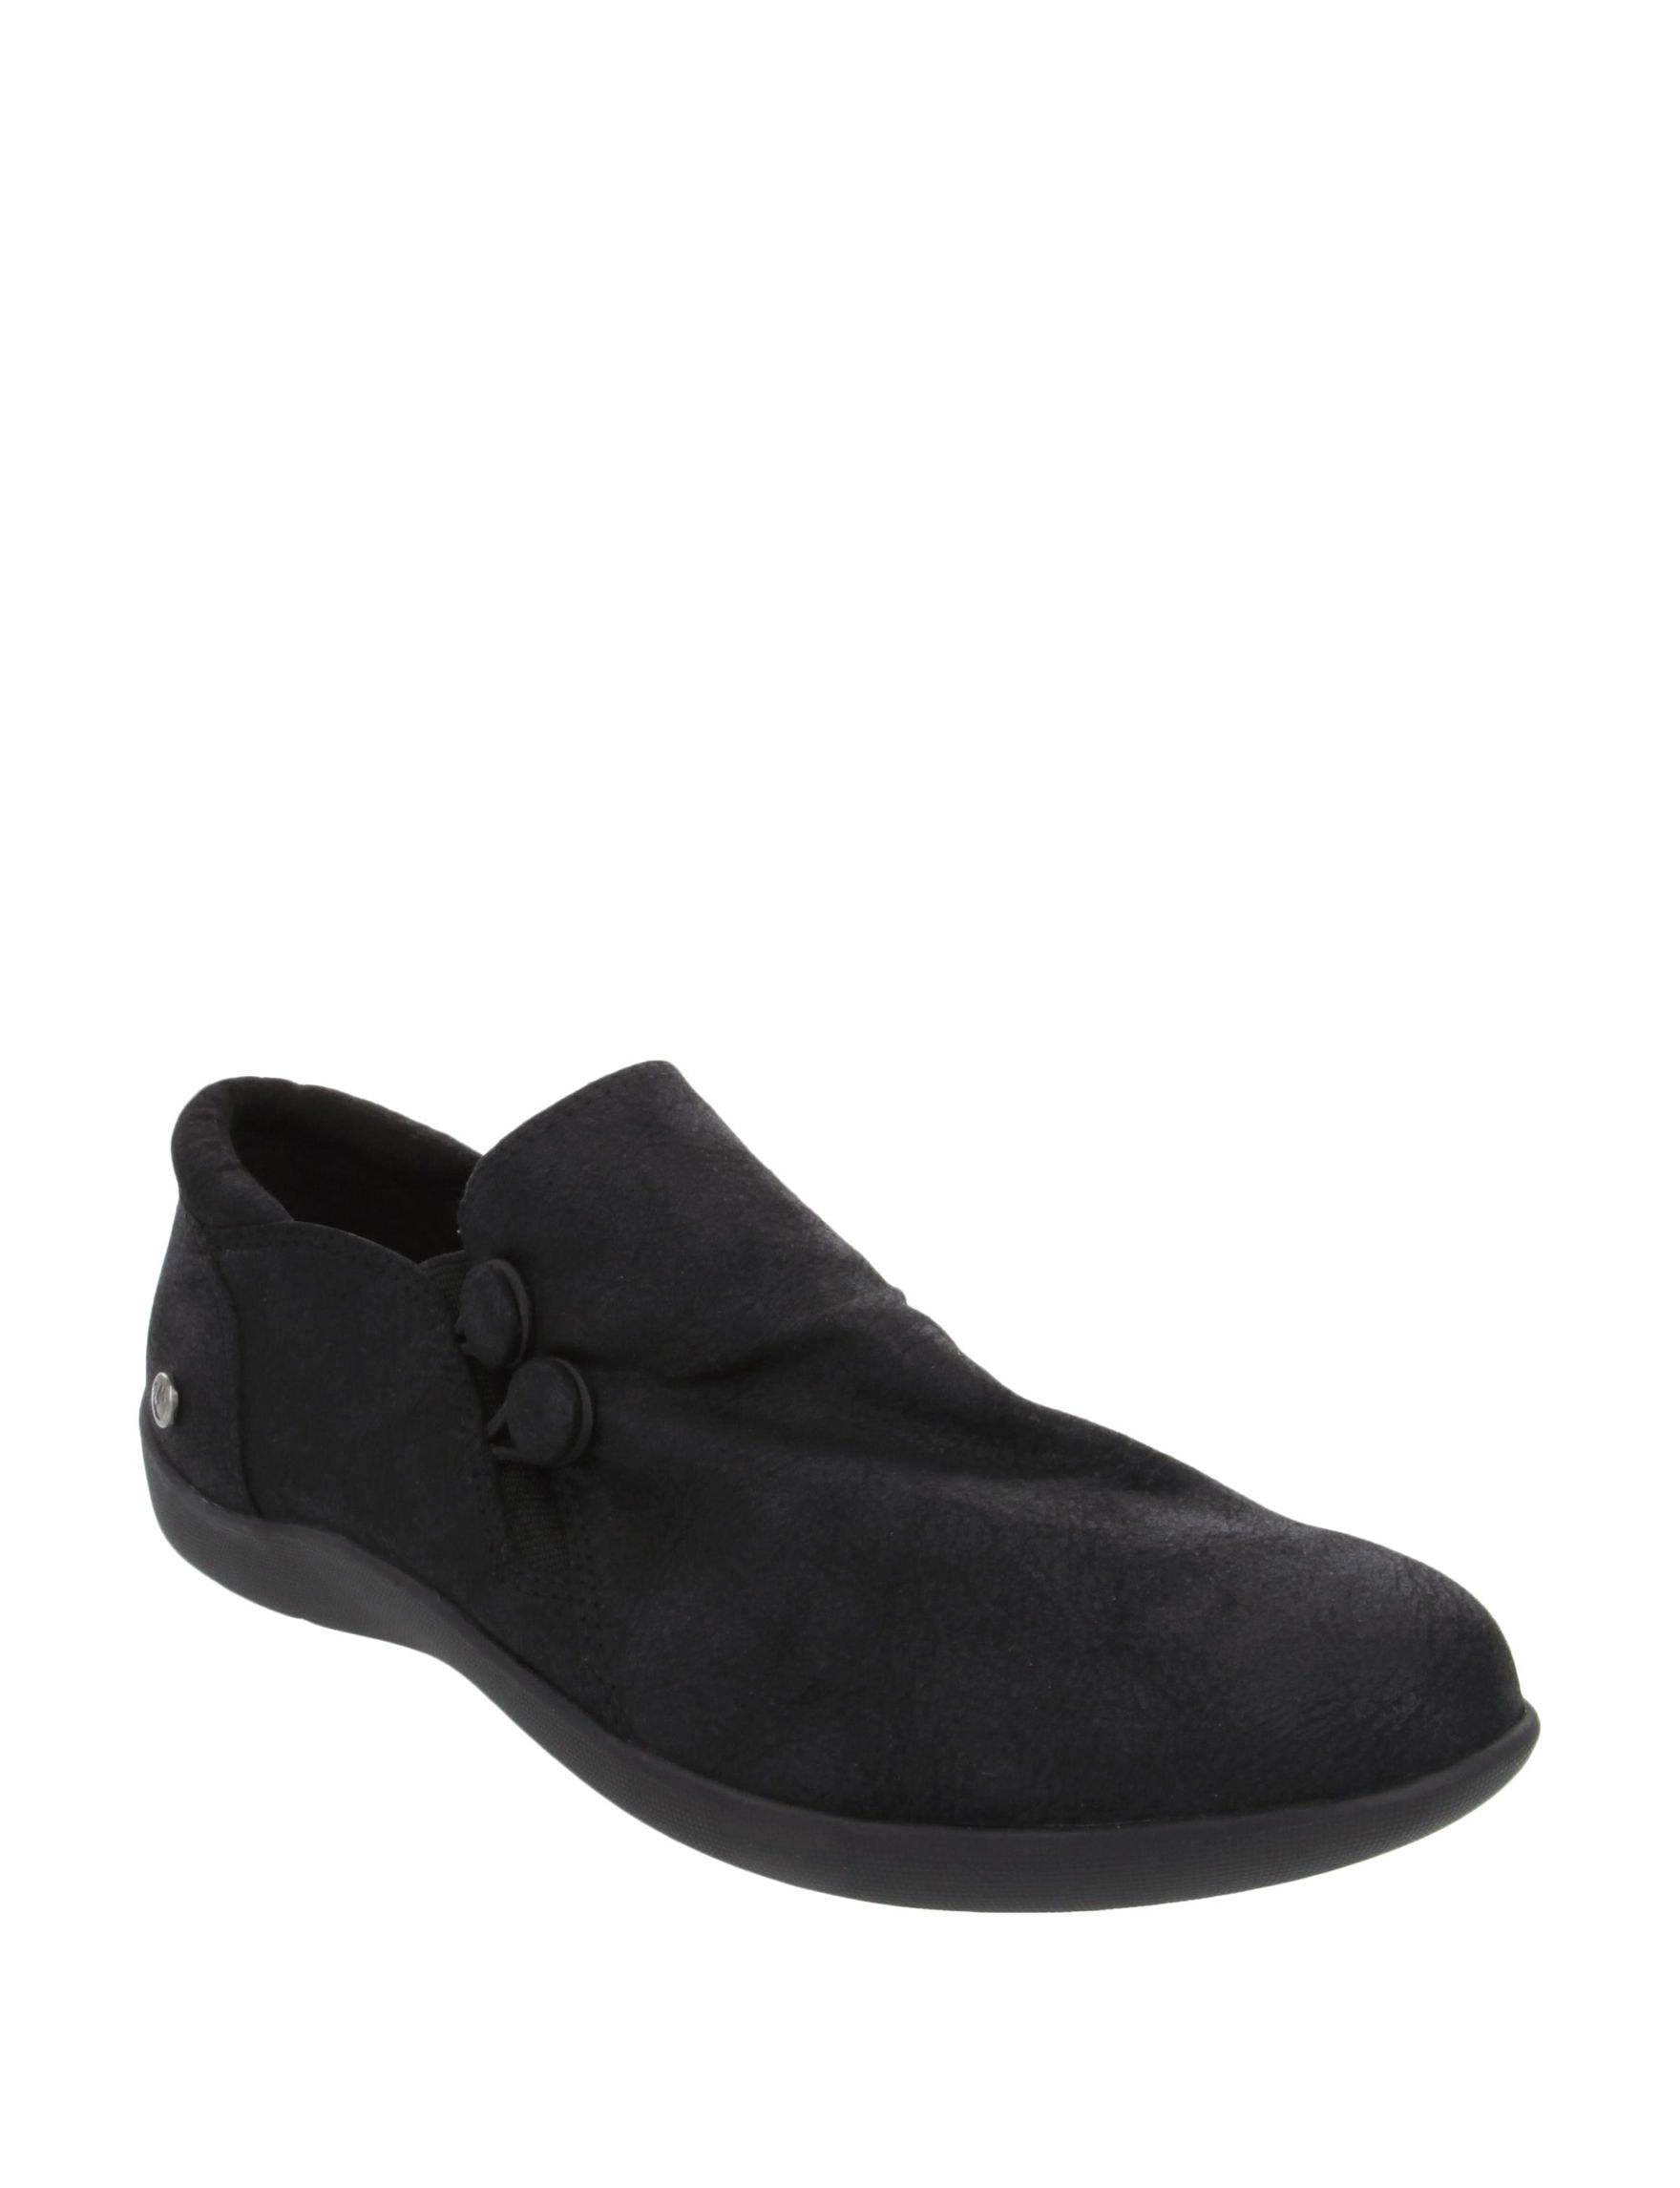 Gloria Vanderbilt Black Comfort Shoes